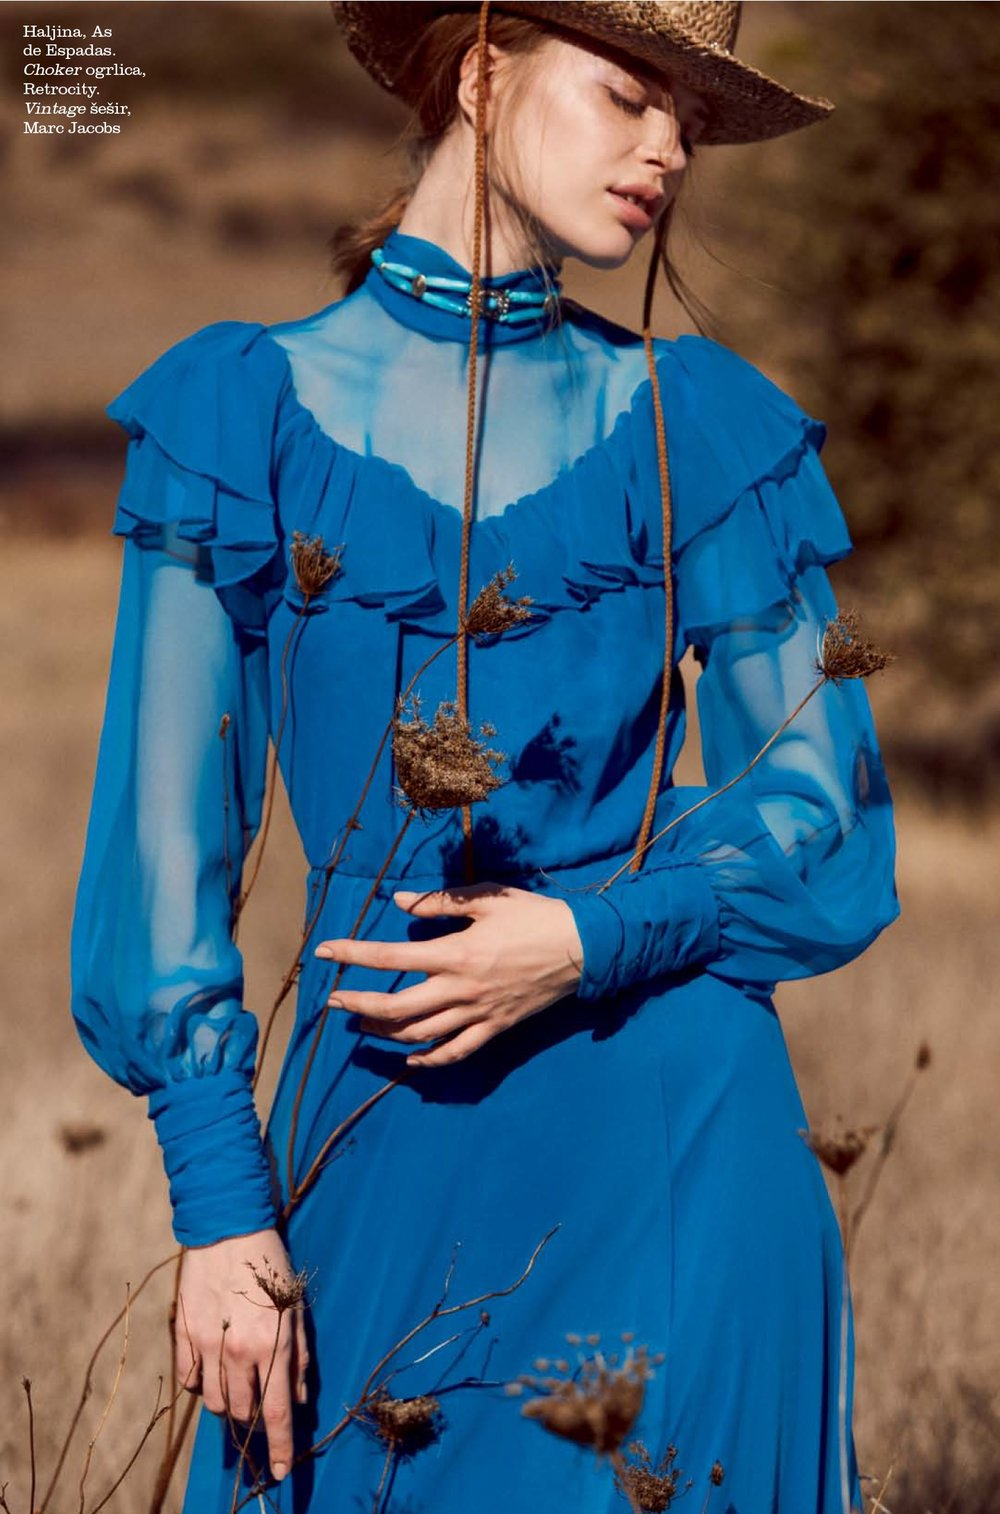 Carlos Teixeira Fashion Photographer for Elle Croatia